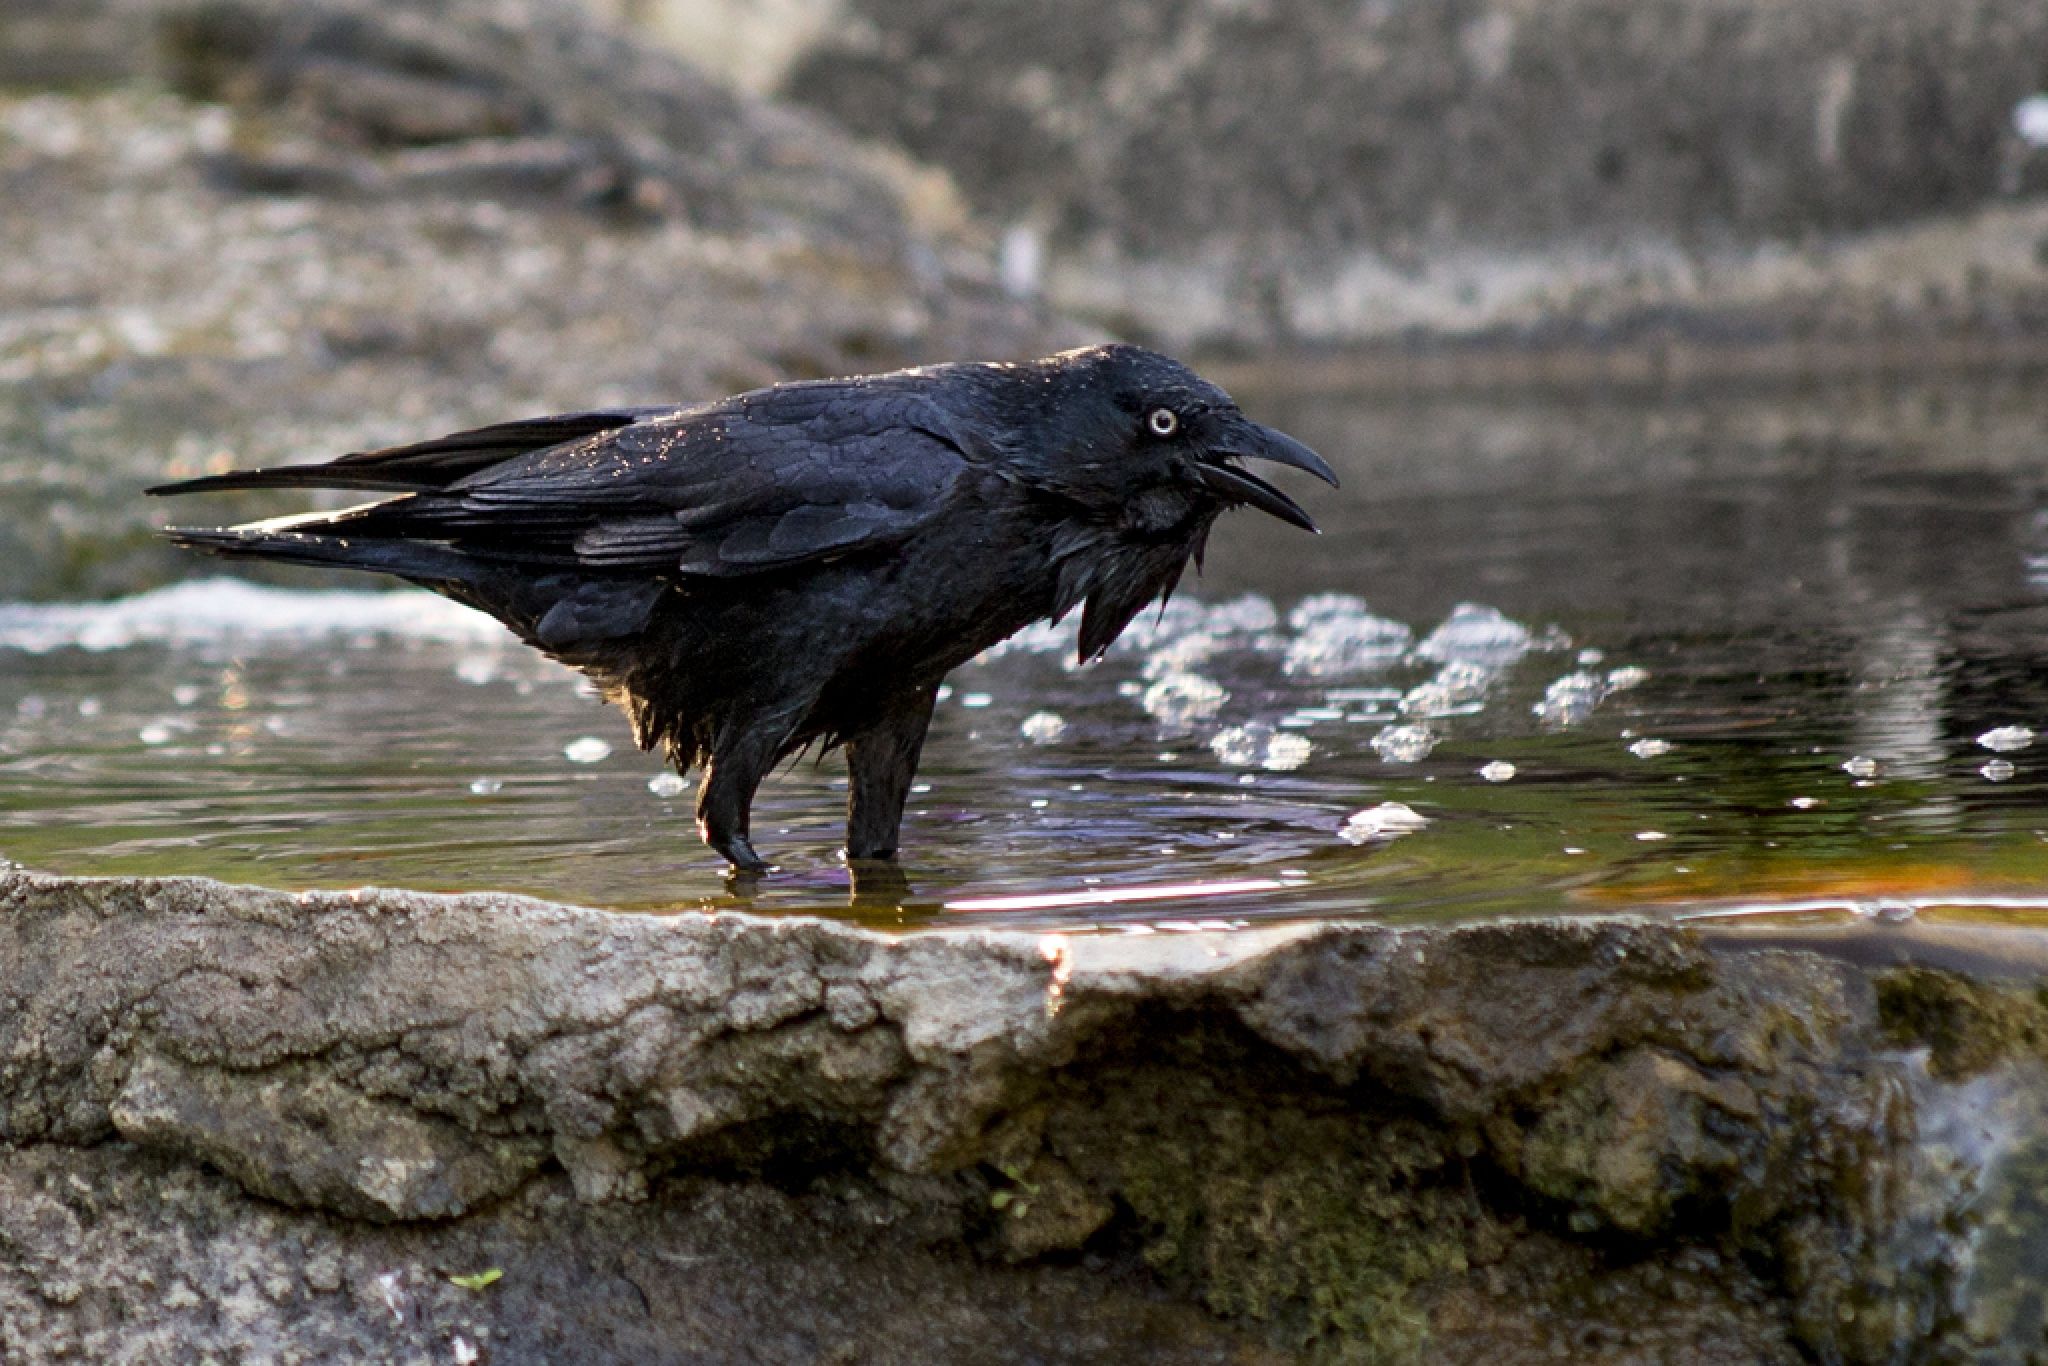 Cemetery Crows 3 by Doc Jones